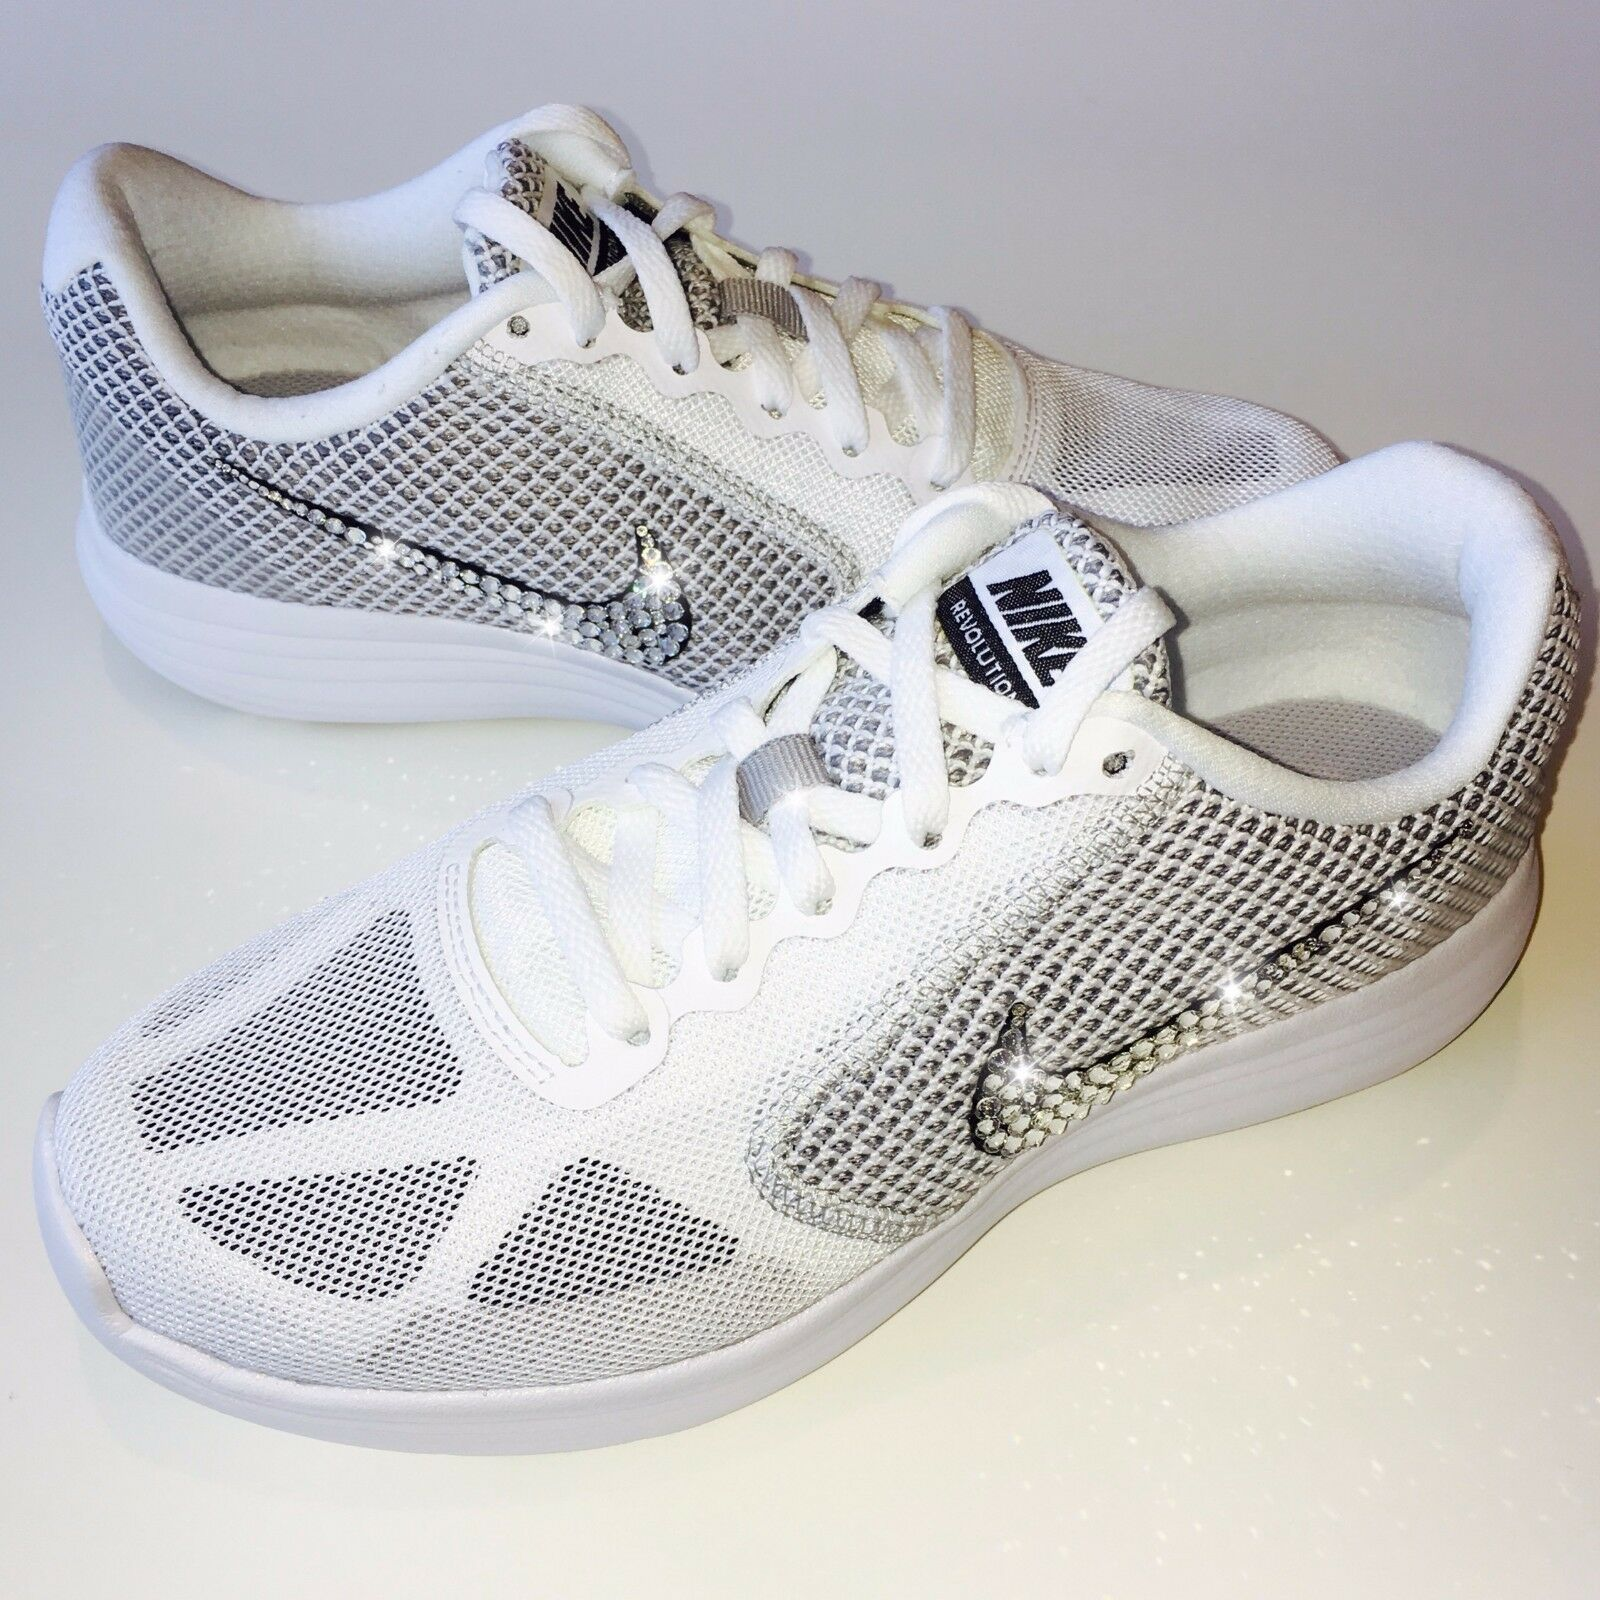 6f4b9e3f9842 NWT Women s Nike Revolution 3 3 3 Shoes w  Swarovski Crystal Bling Bedazzled  Swoosh fd8100